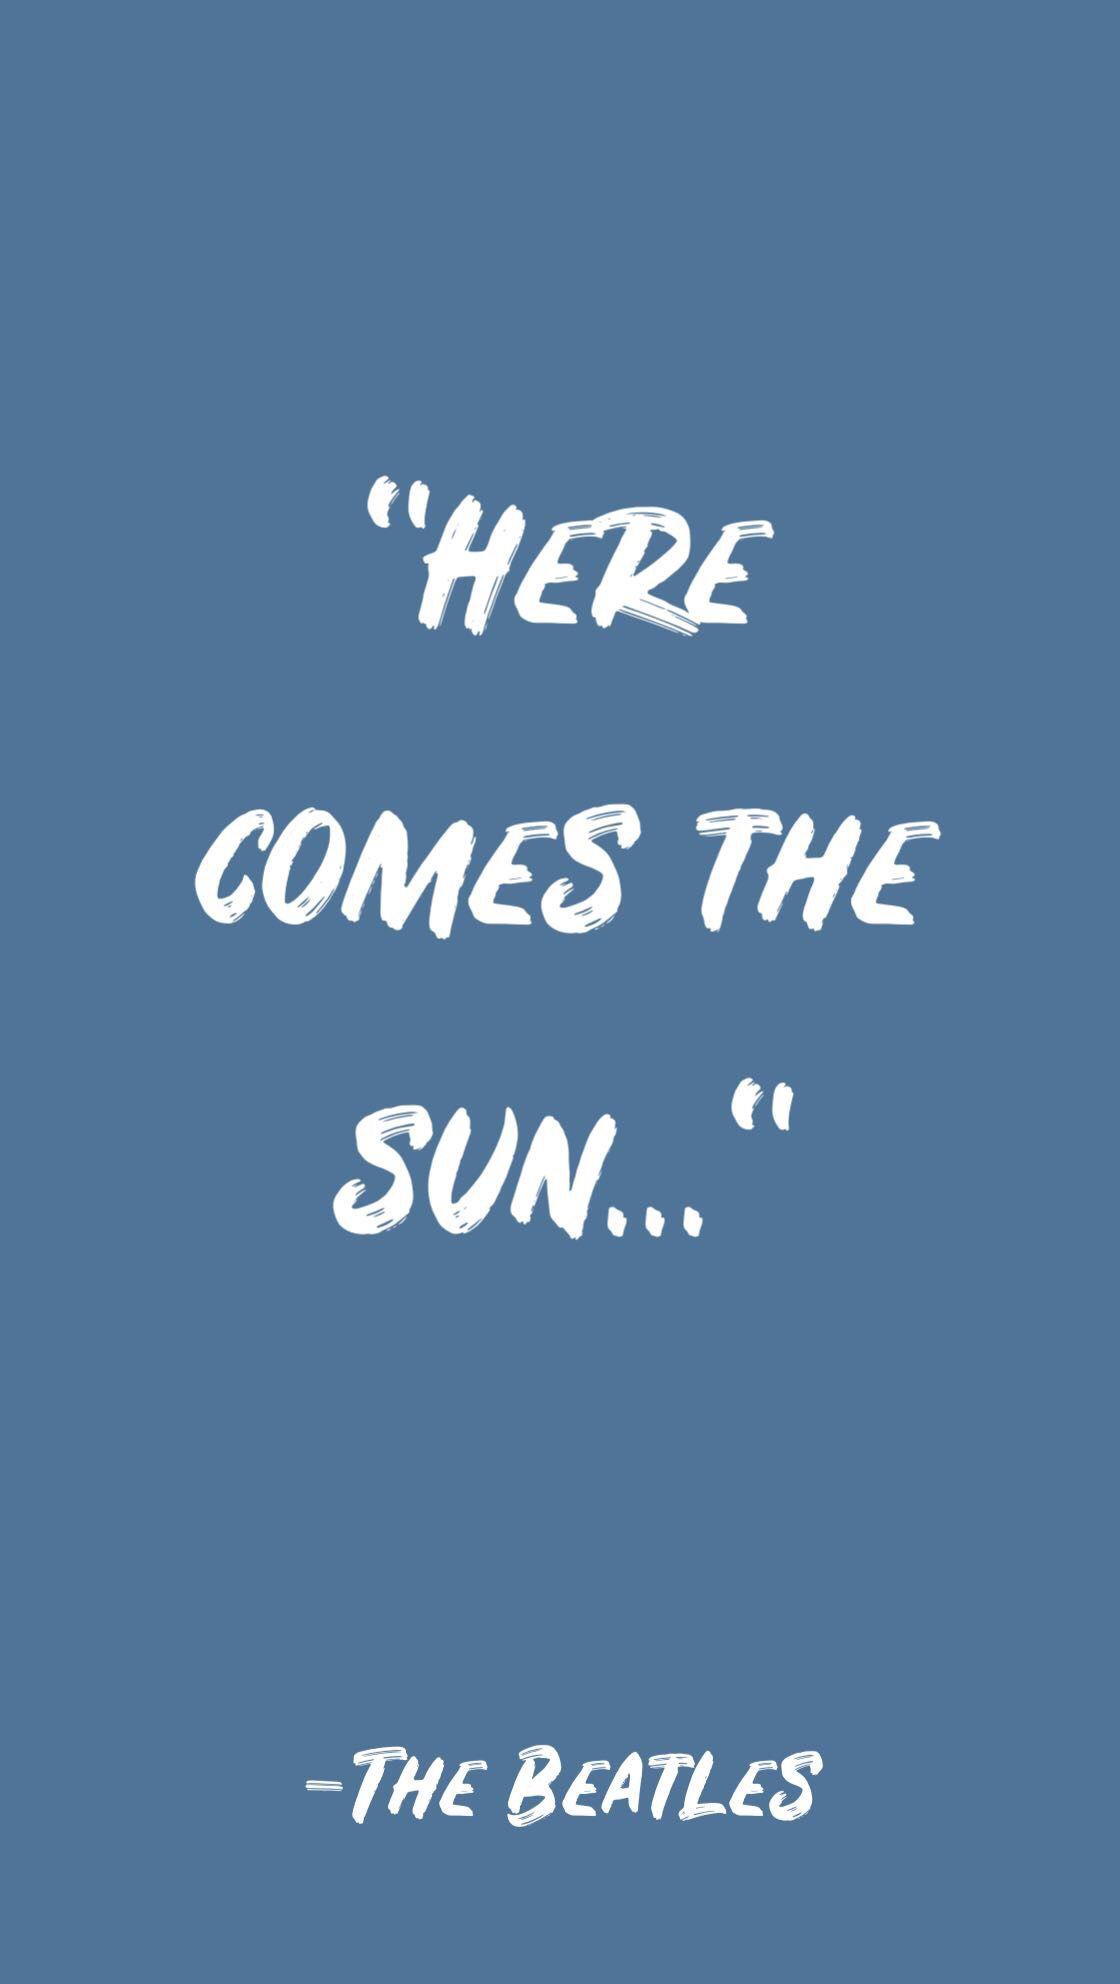 Inspirational Quotes Inspirational Quotes Self Love Motivation Truth Beatles Quotes Beatles Quotes Lyrics Bubble Quotes